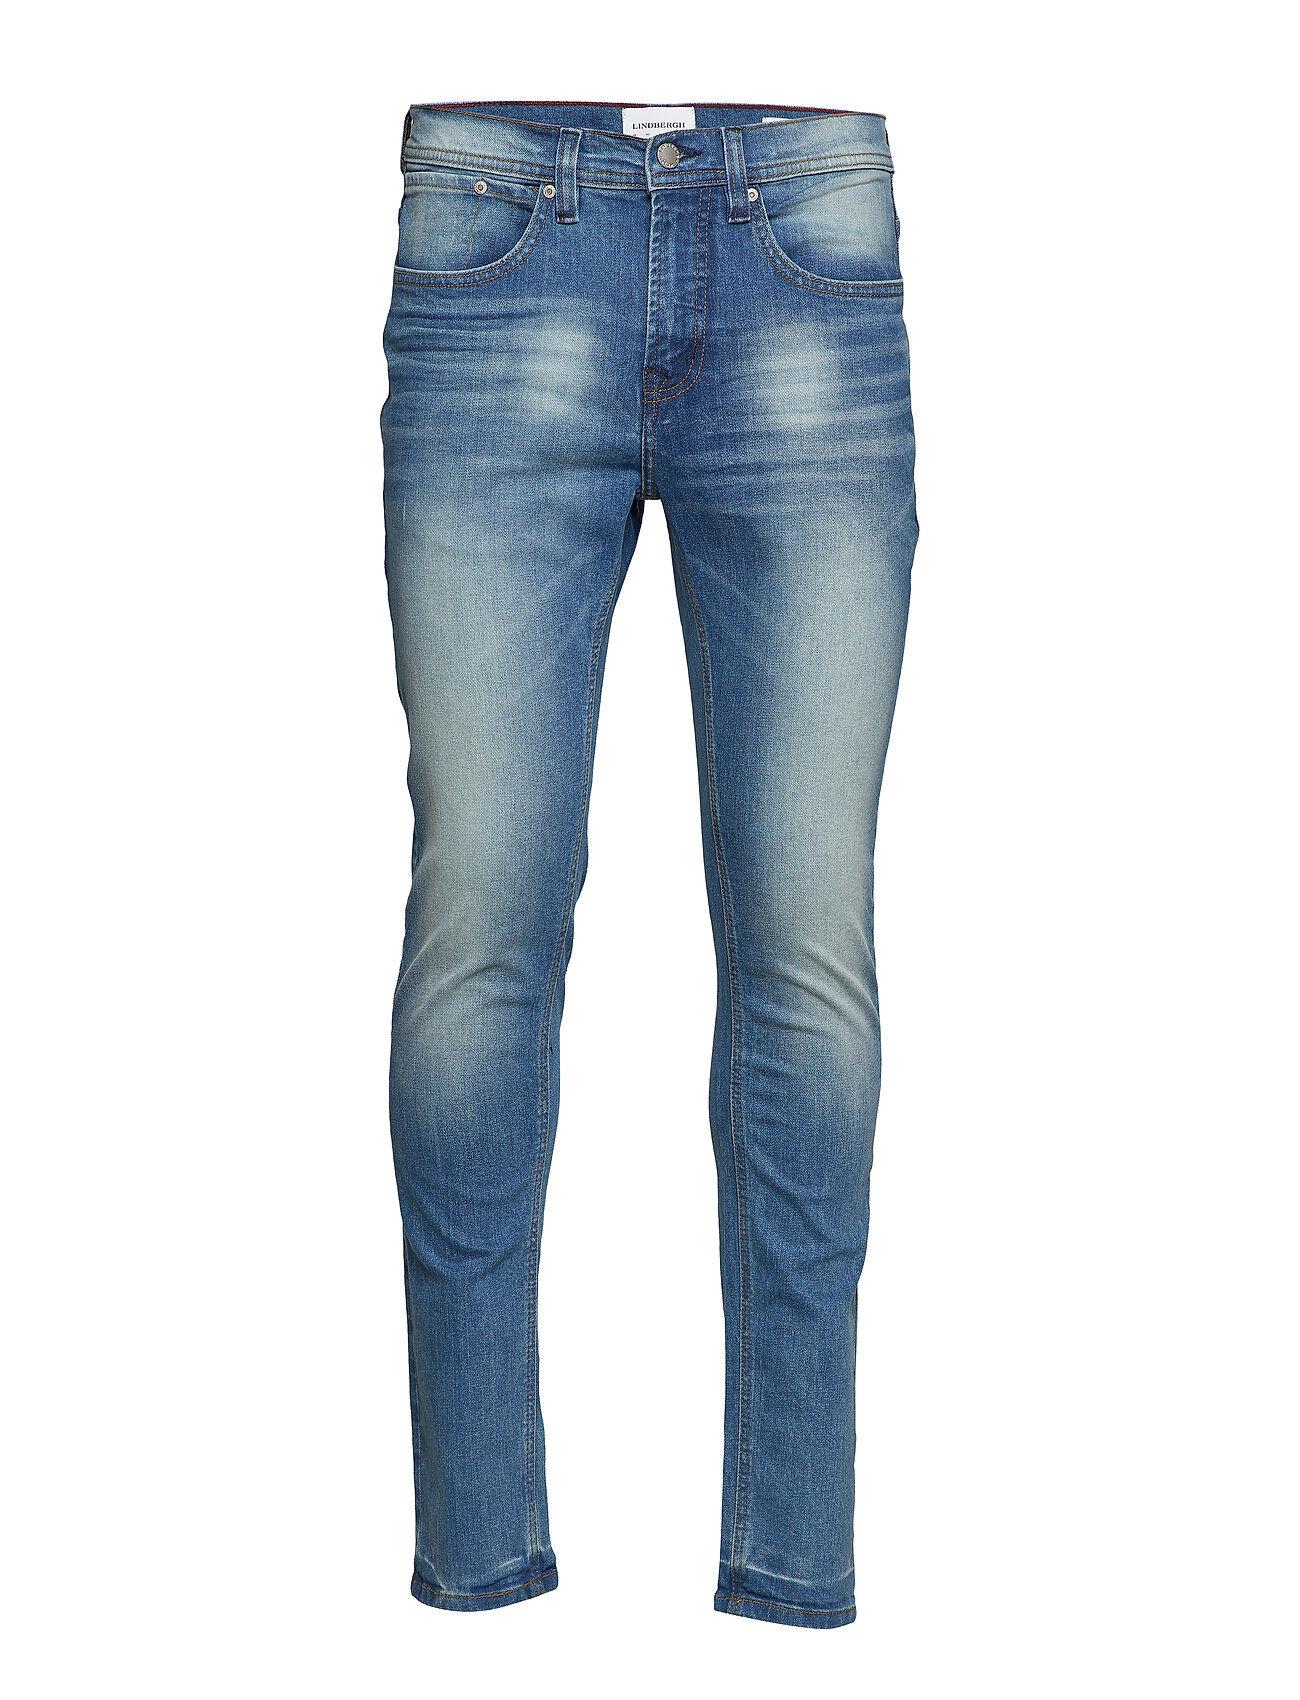 Lindbergh Slim Fit Jeans Boardwalk Blue